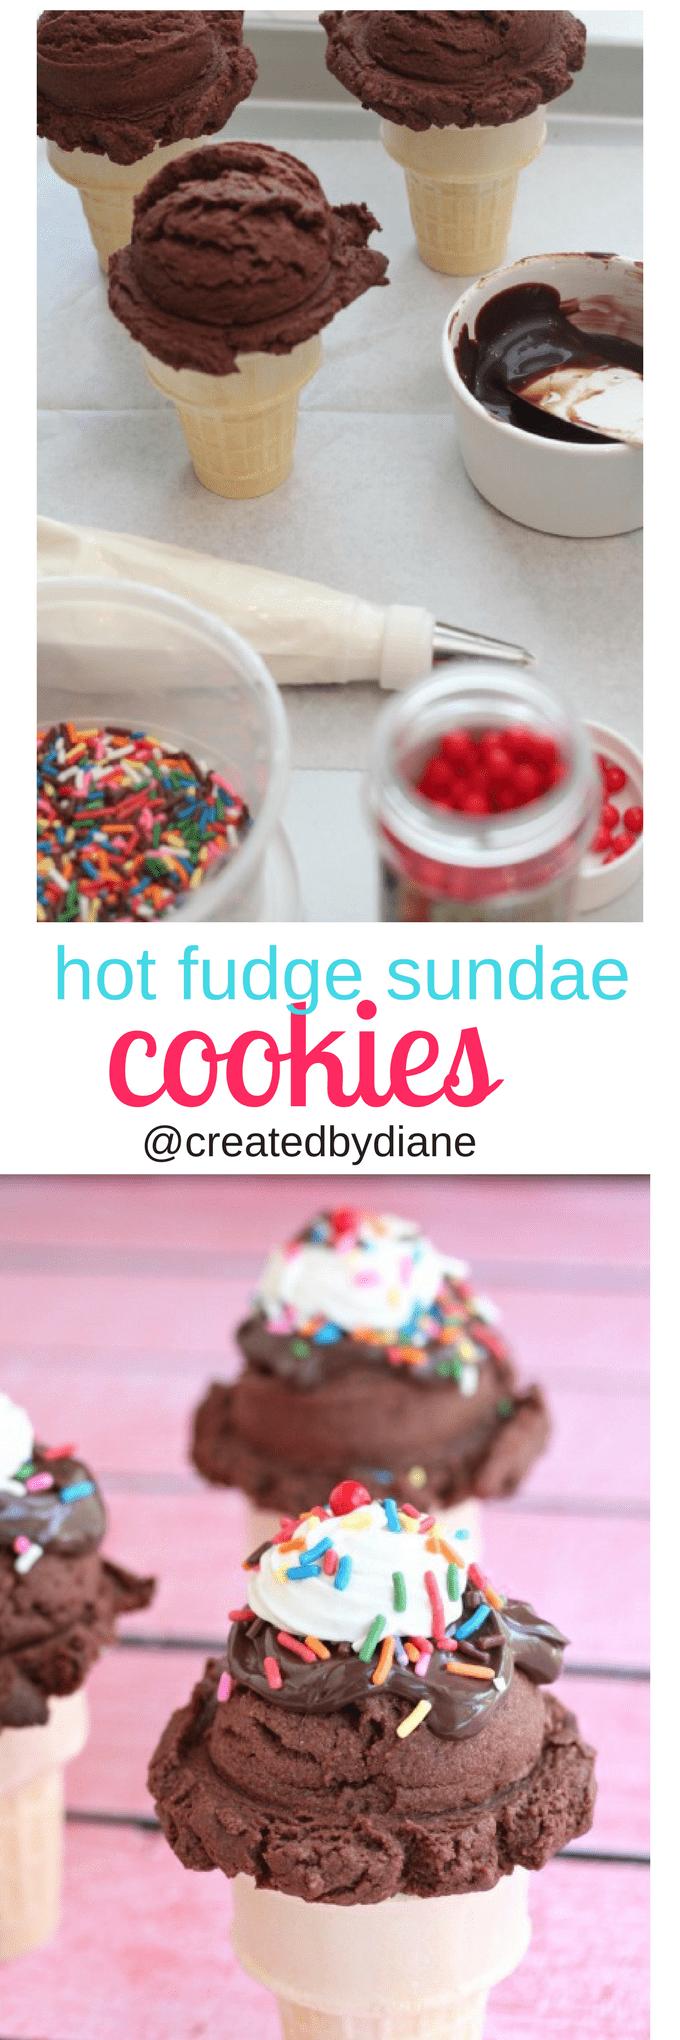 hot fudge sundae cookies on top of ice cream cones @createdbydiane